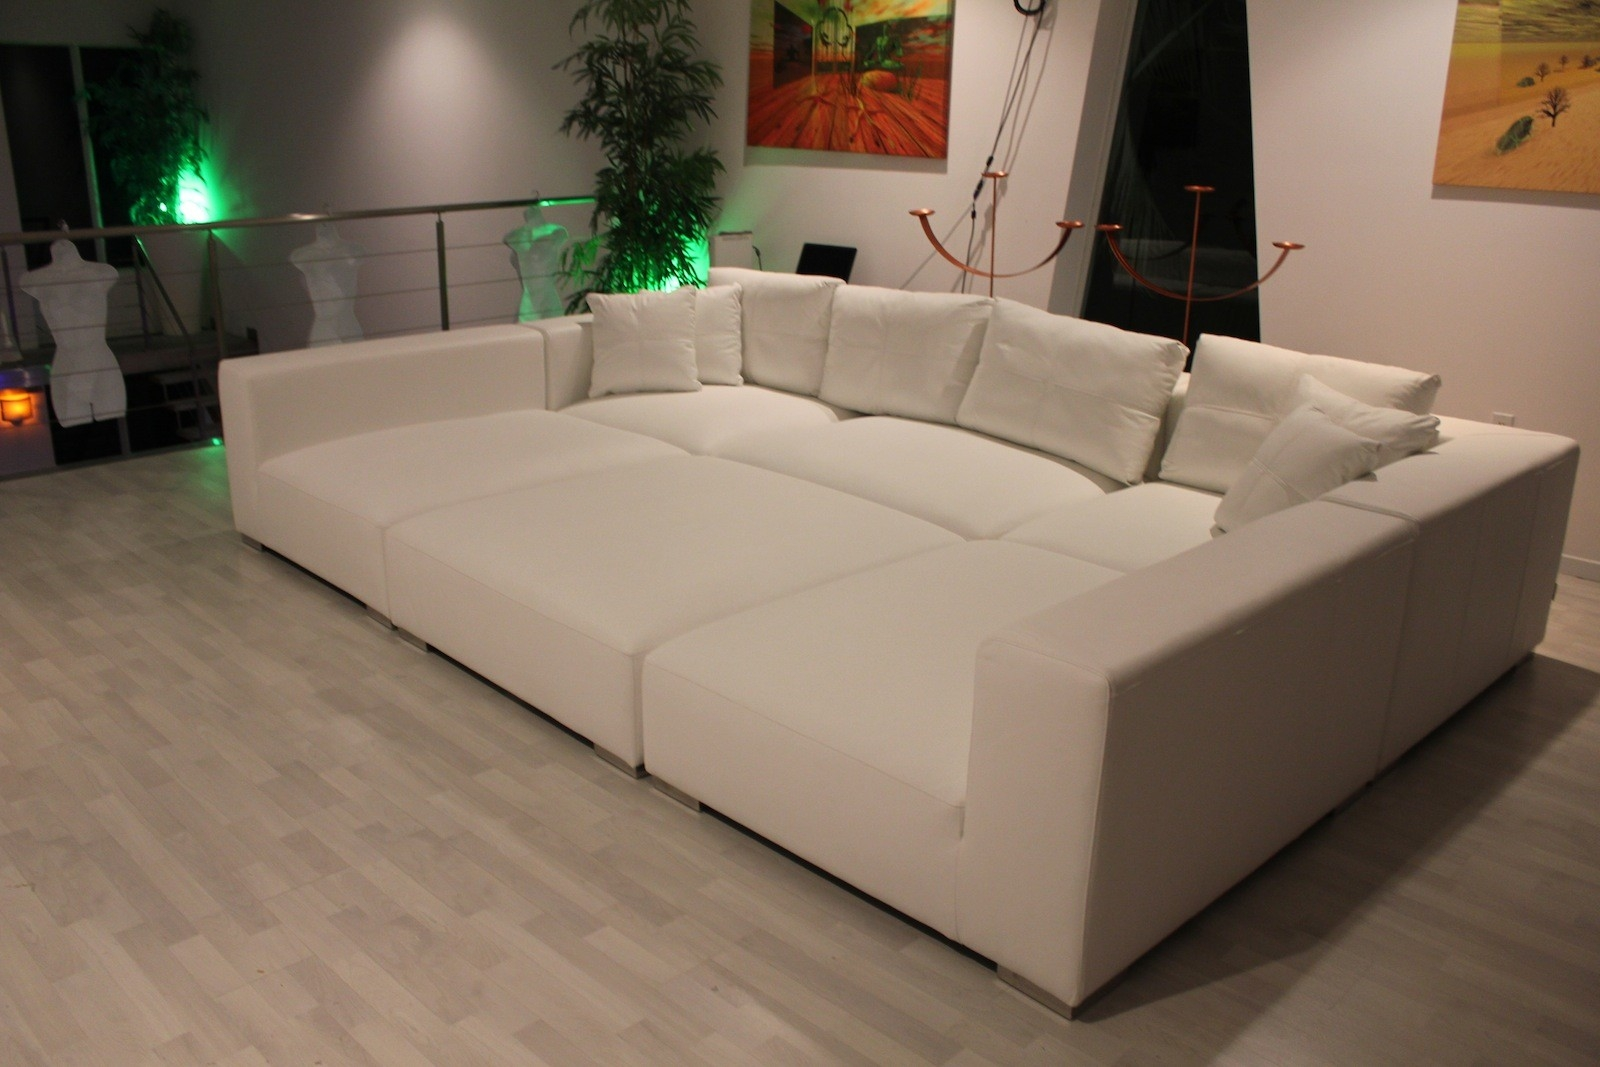 sofa liquidation sale sleeper austin 12 best ideas of closeout sectional sofas